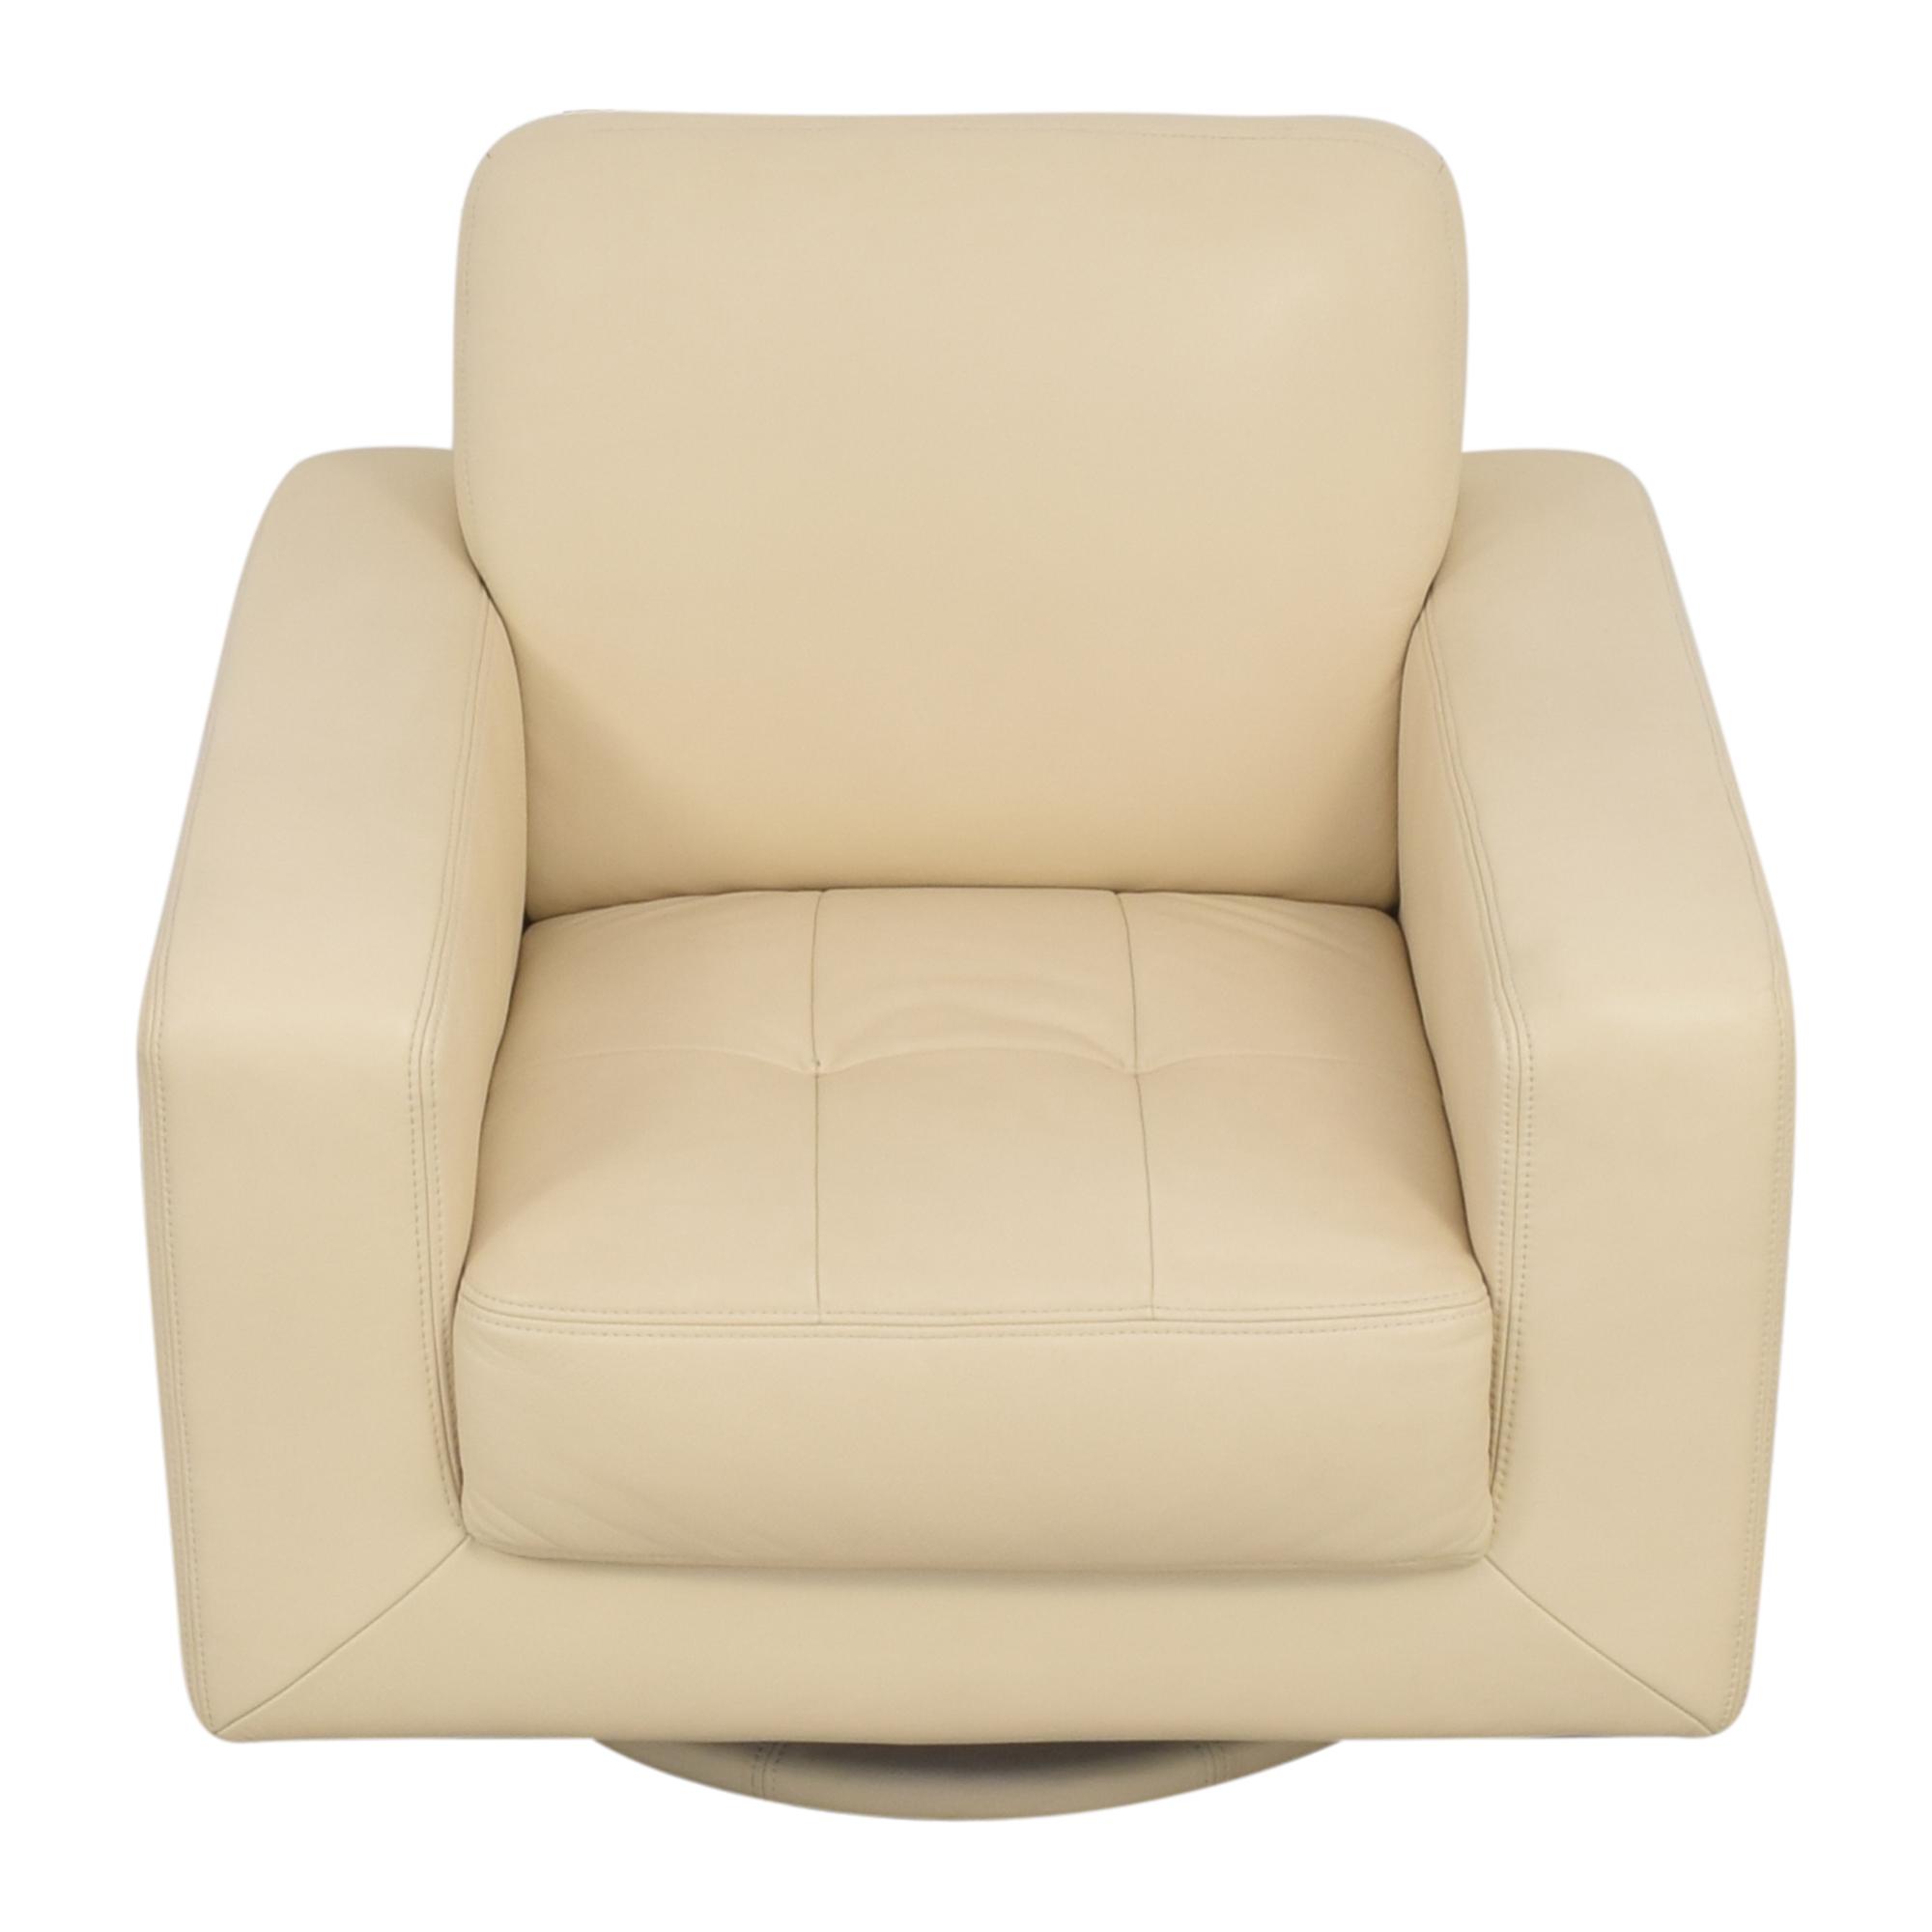 Maurice Villency Maurice Villency Bond Swivel Chair pa